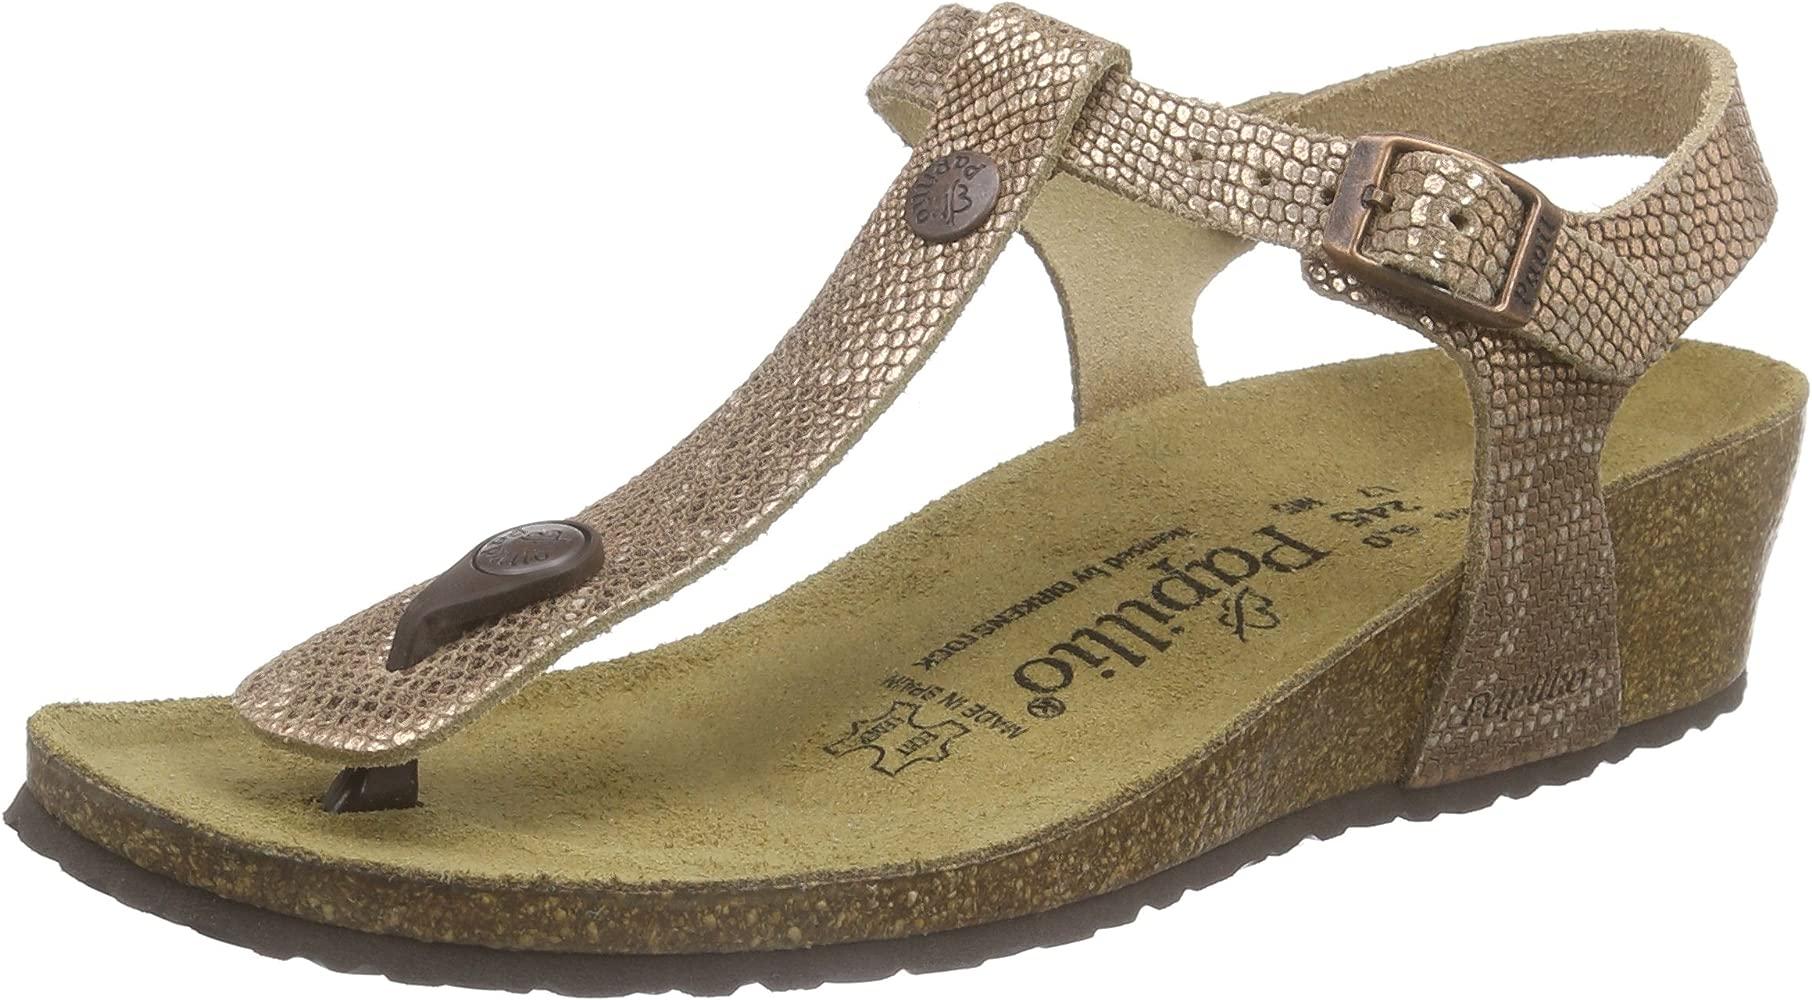 Ashley Leder, Women's Wedge Heel Ankle Strap Sandals